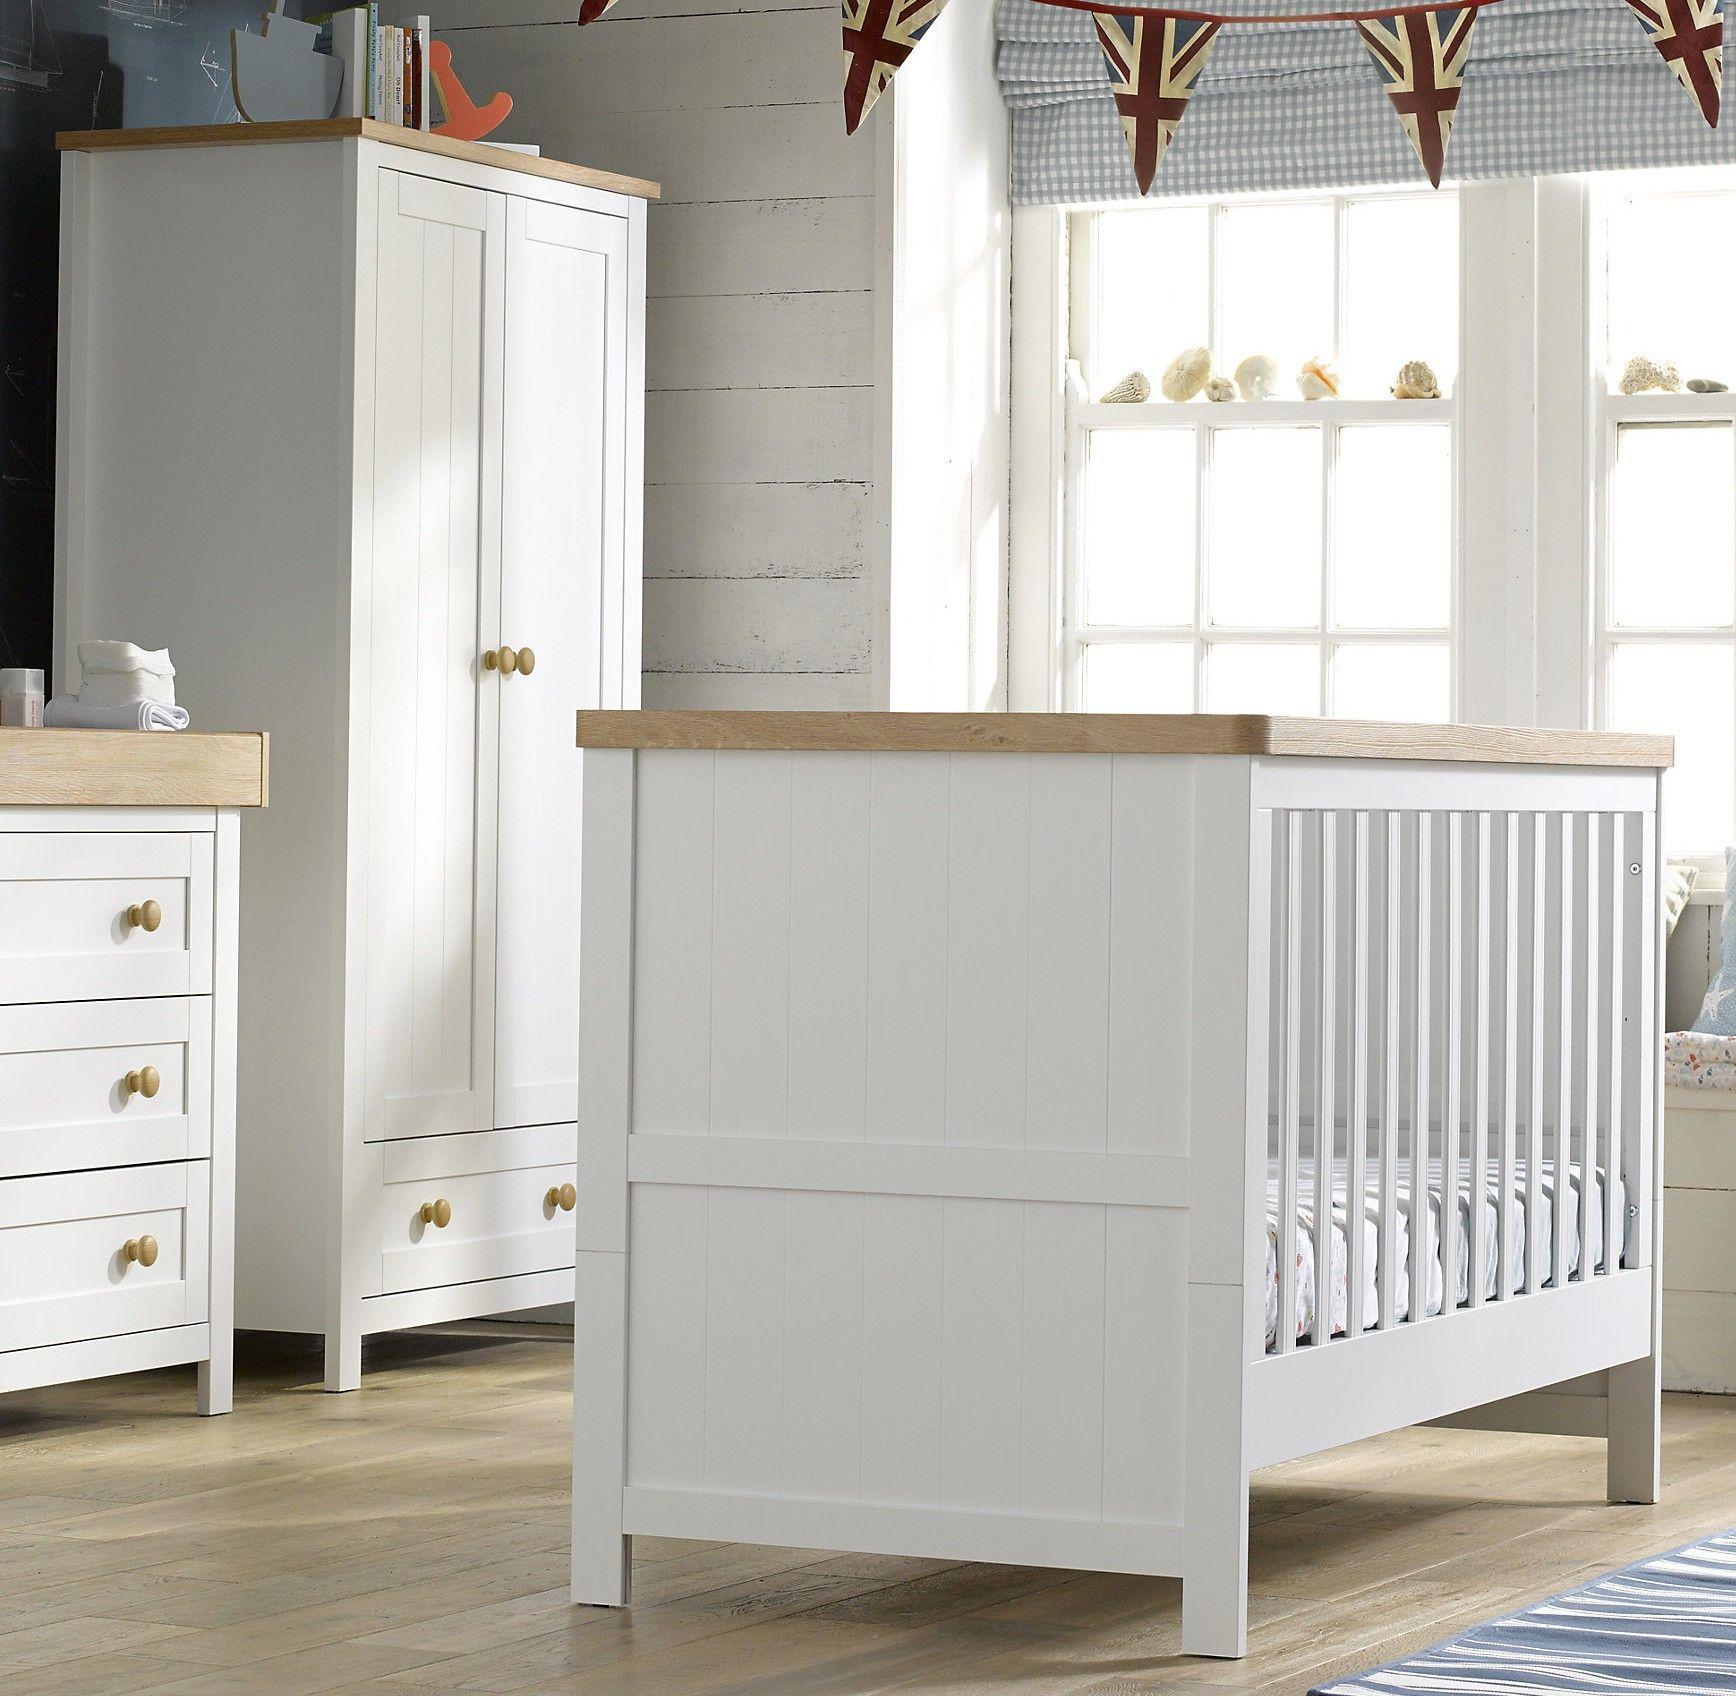 Lit bébé évolutif moderne blanc 70x140 Chambre 2